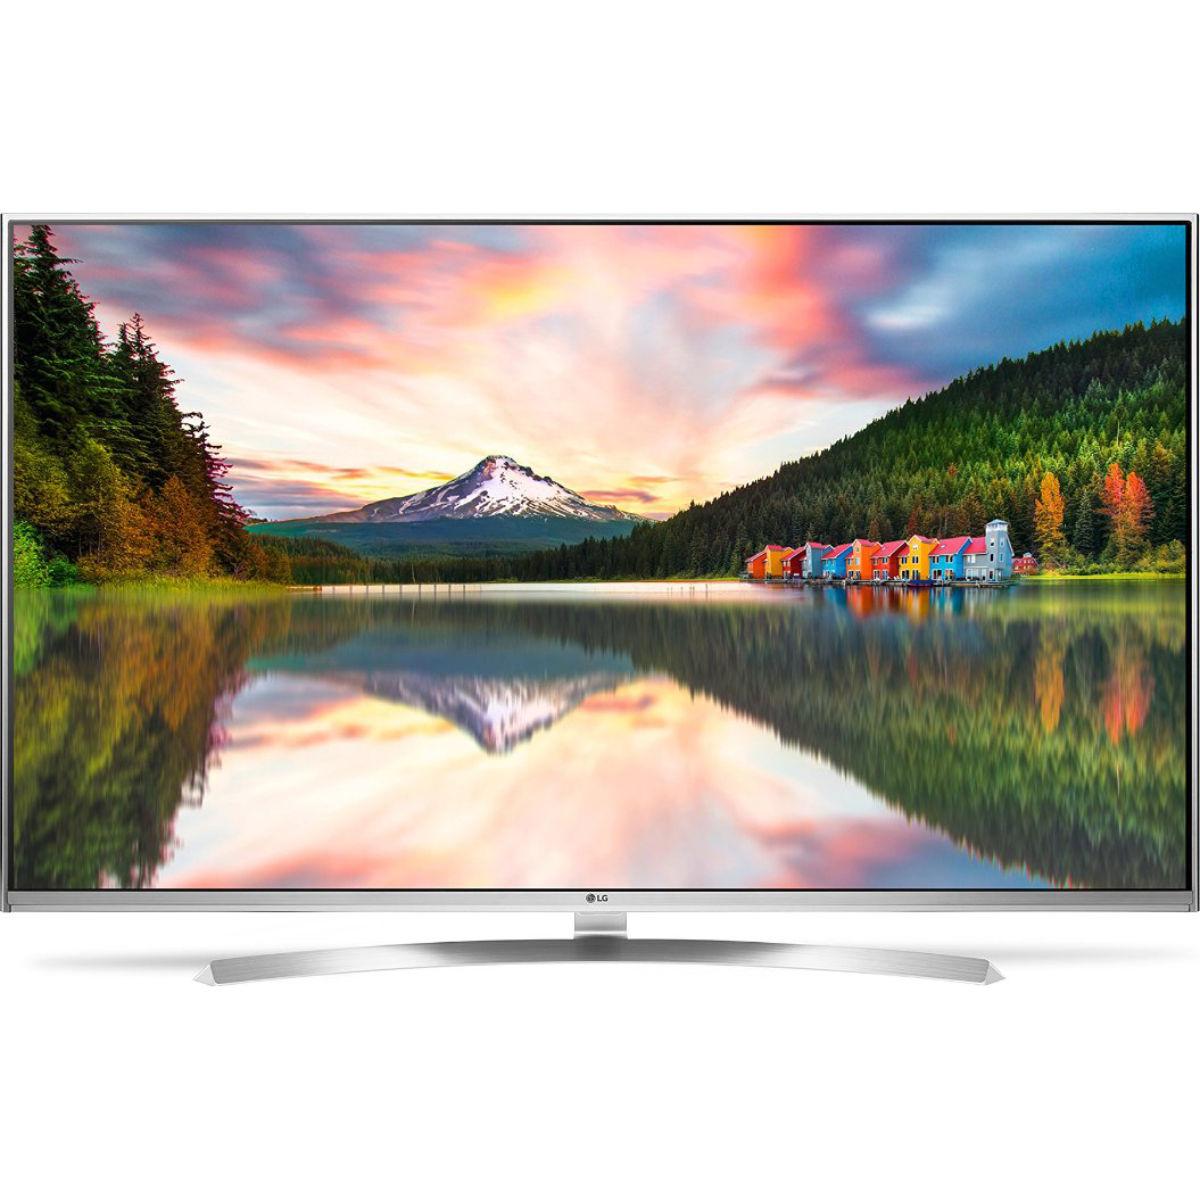 "65"" LG 65uh8500 4K UHD Smart LED HDTV $1599 + free shipping"